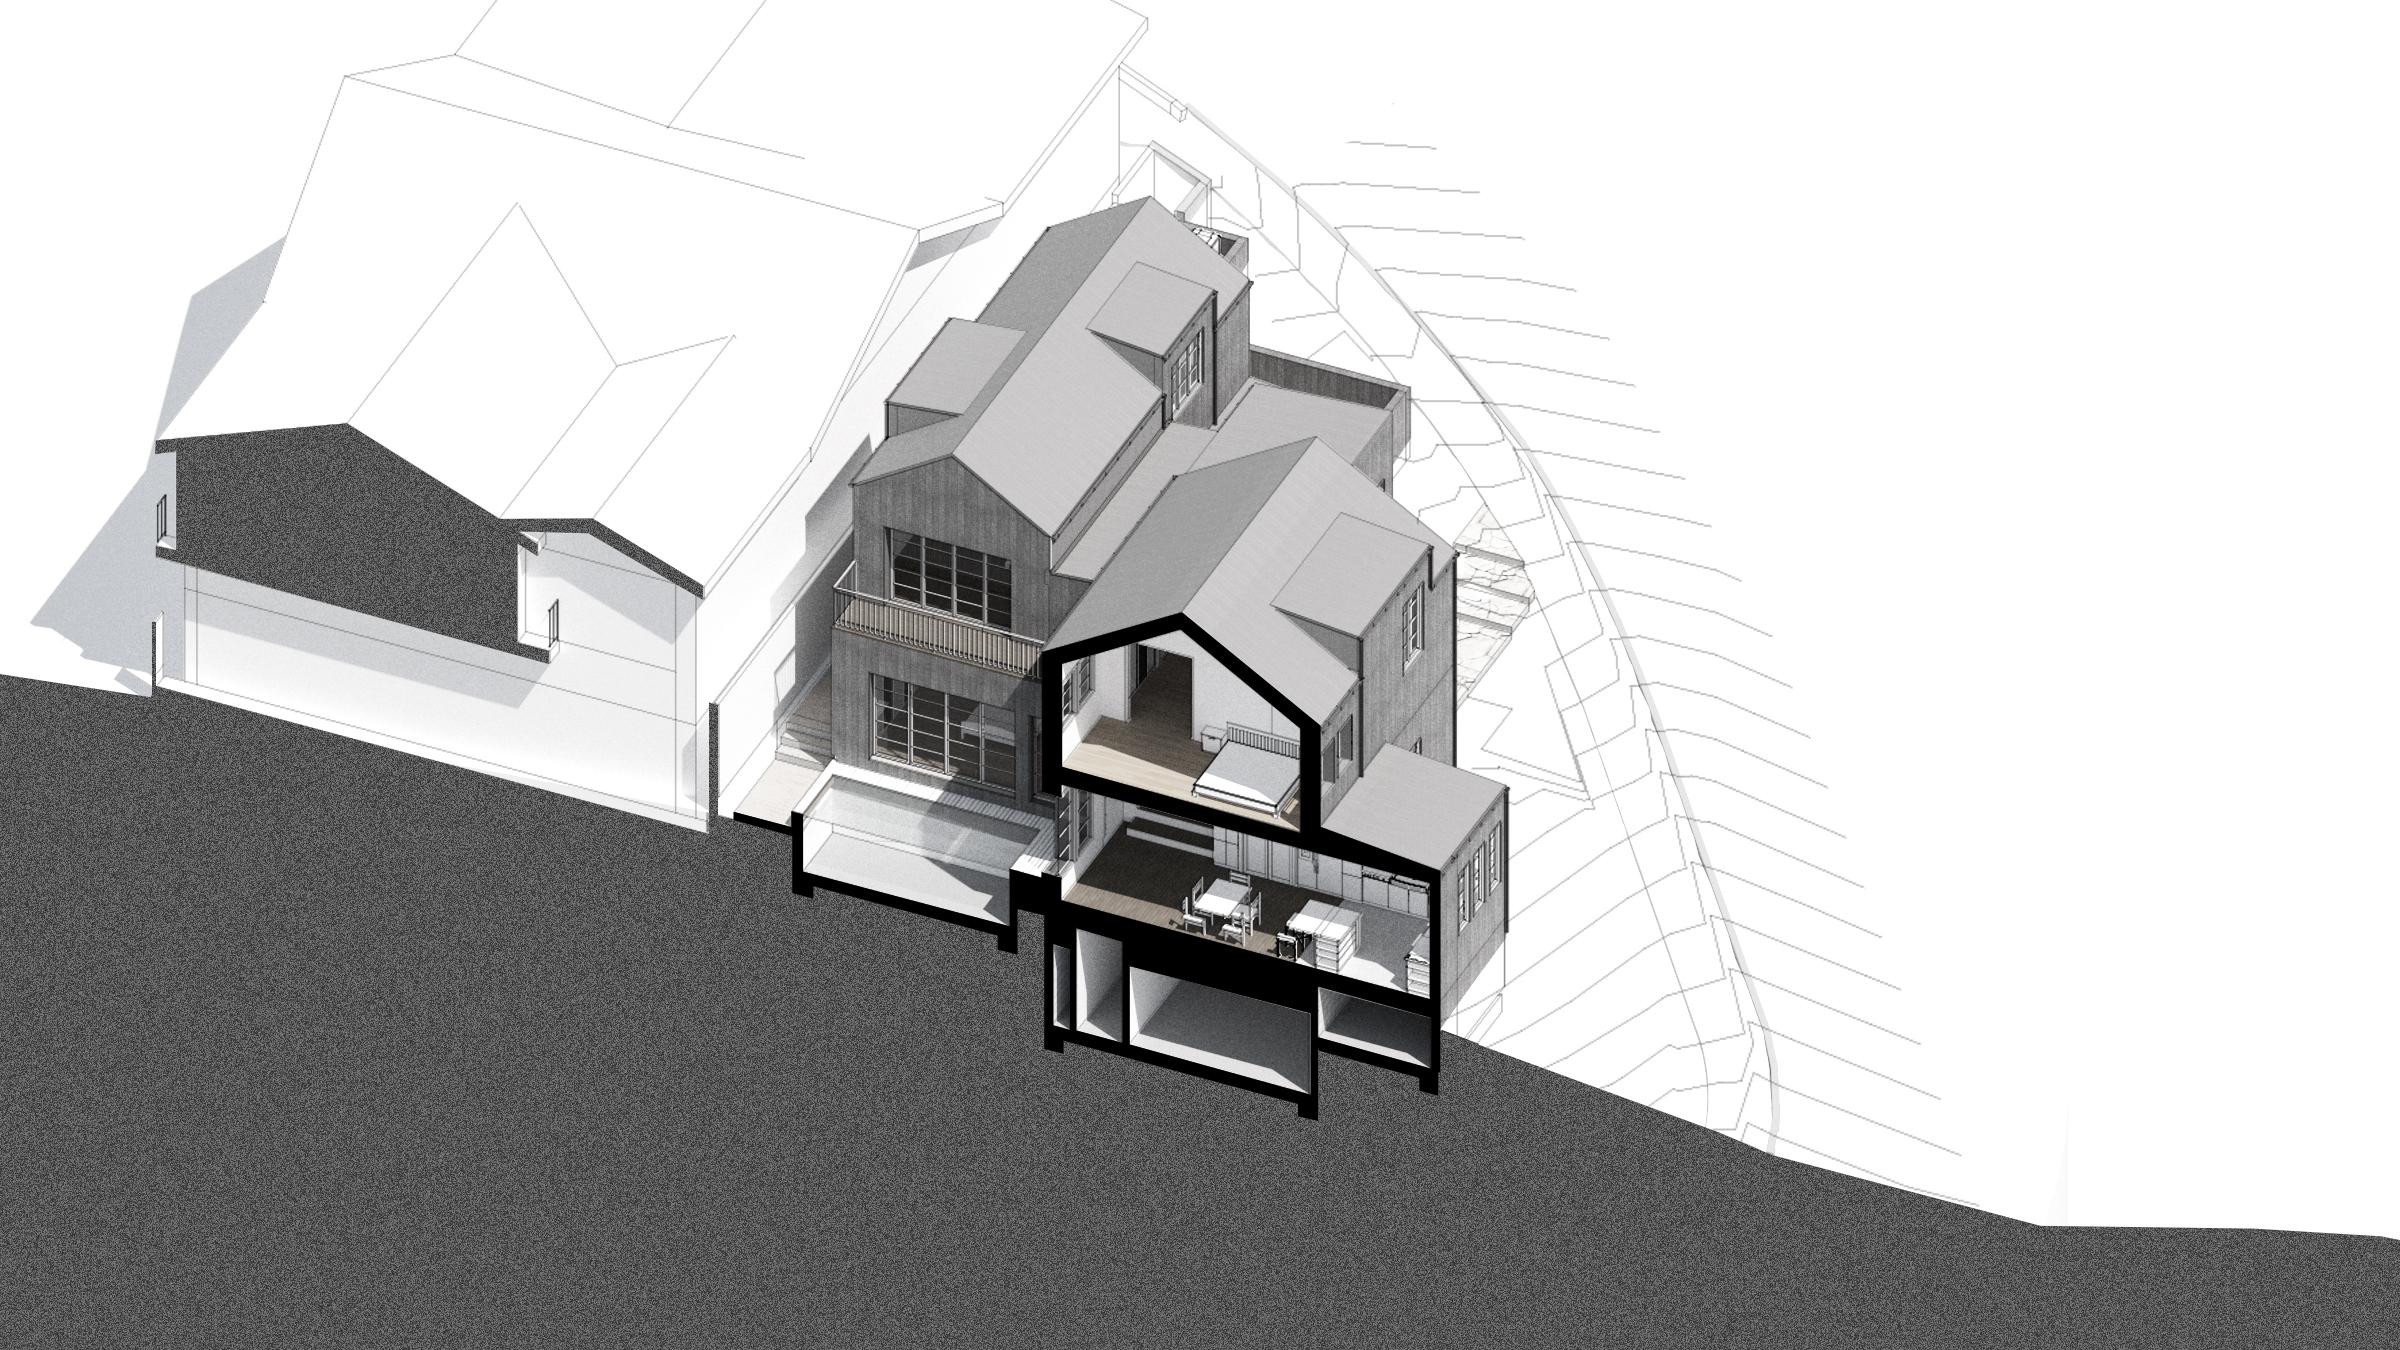 Section_02.jpg